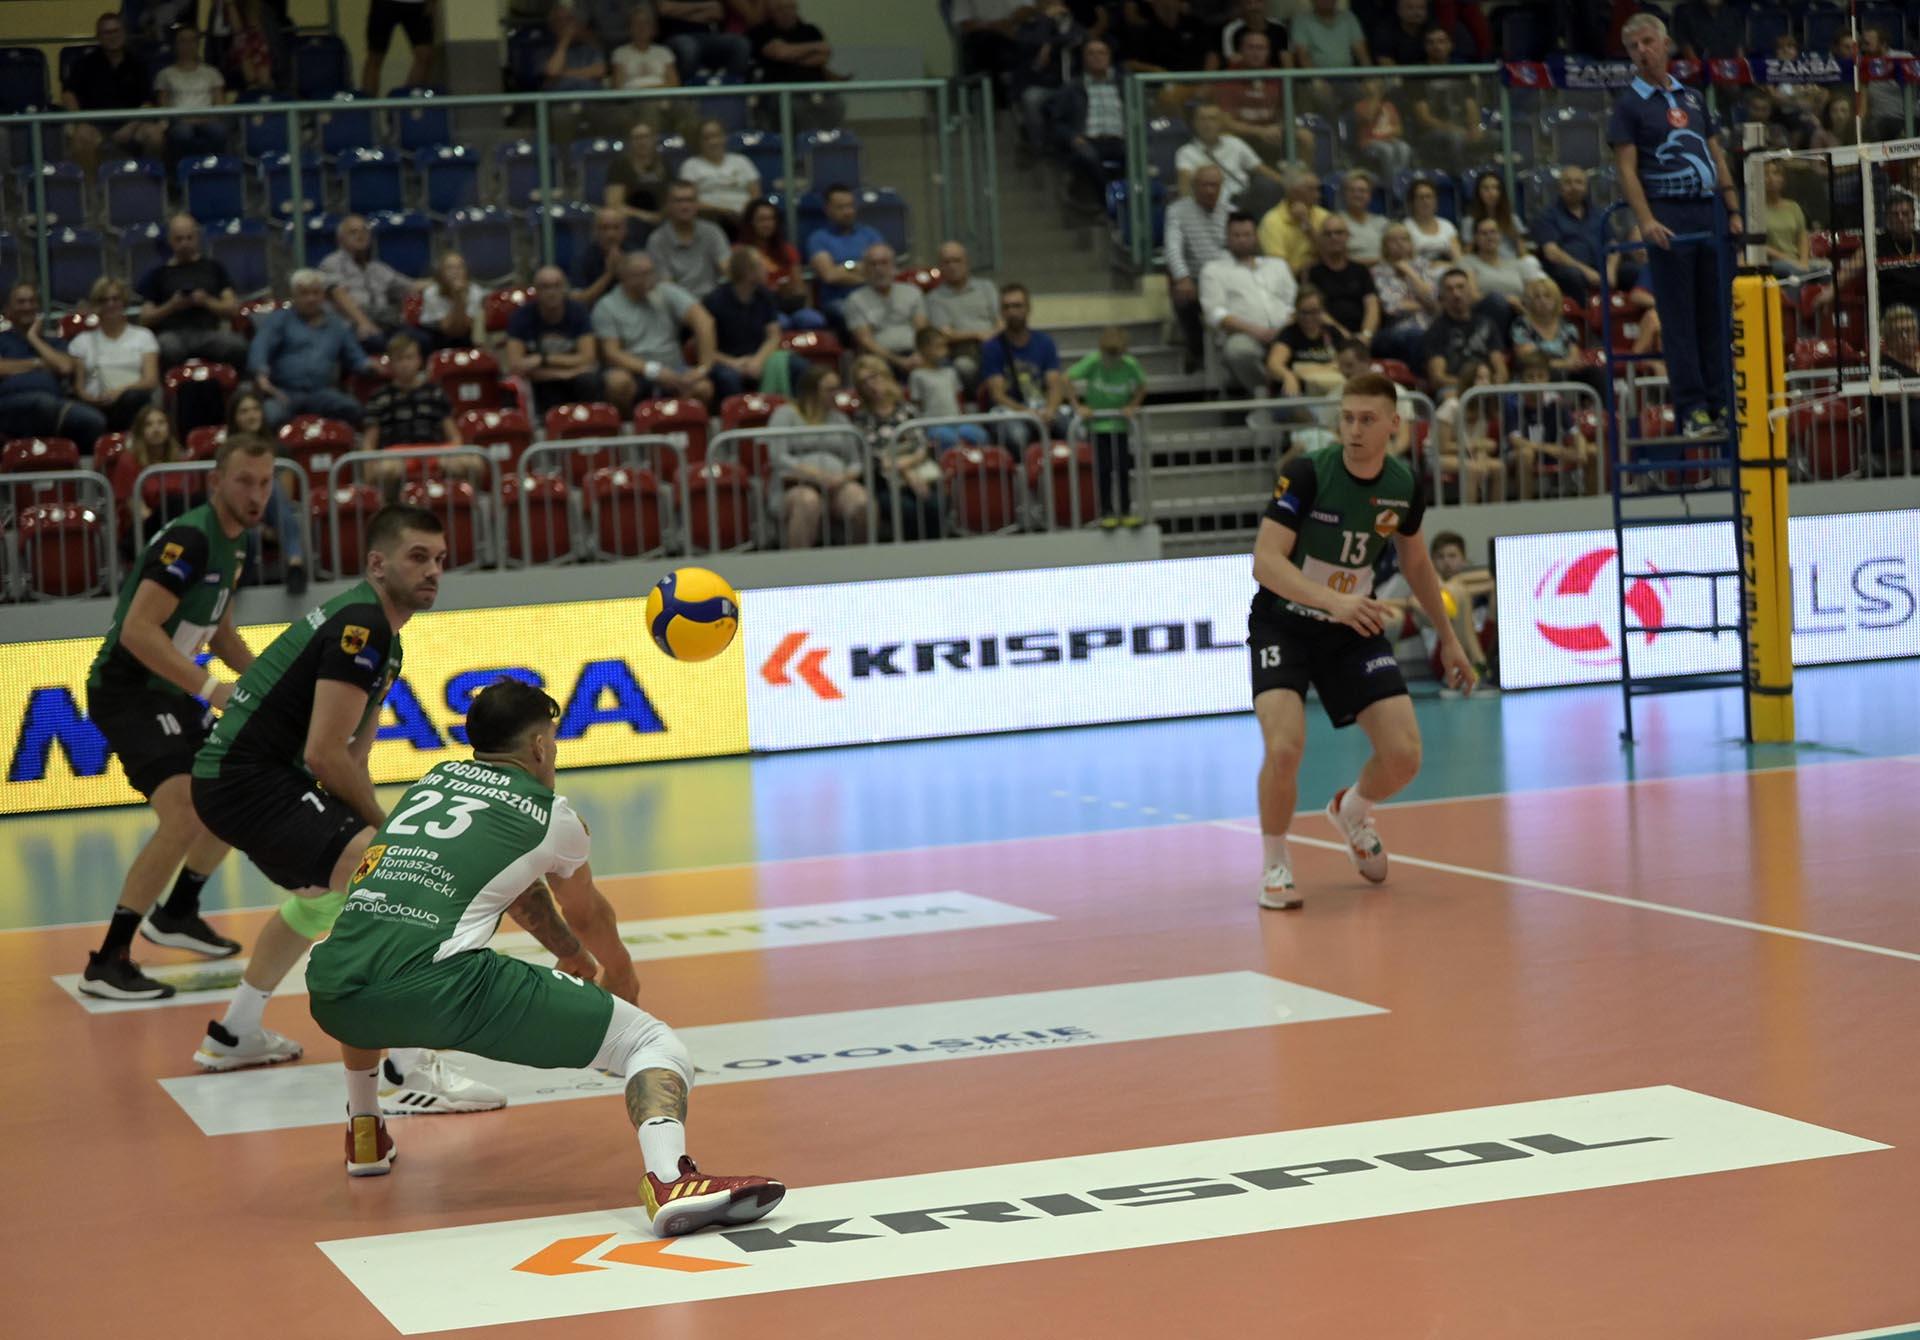 krispol-1-liga-podsumowuje-sezon-i-podaje-statystyki-4